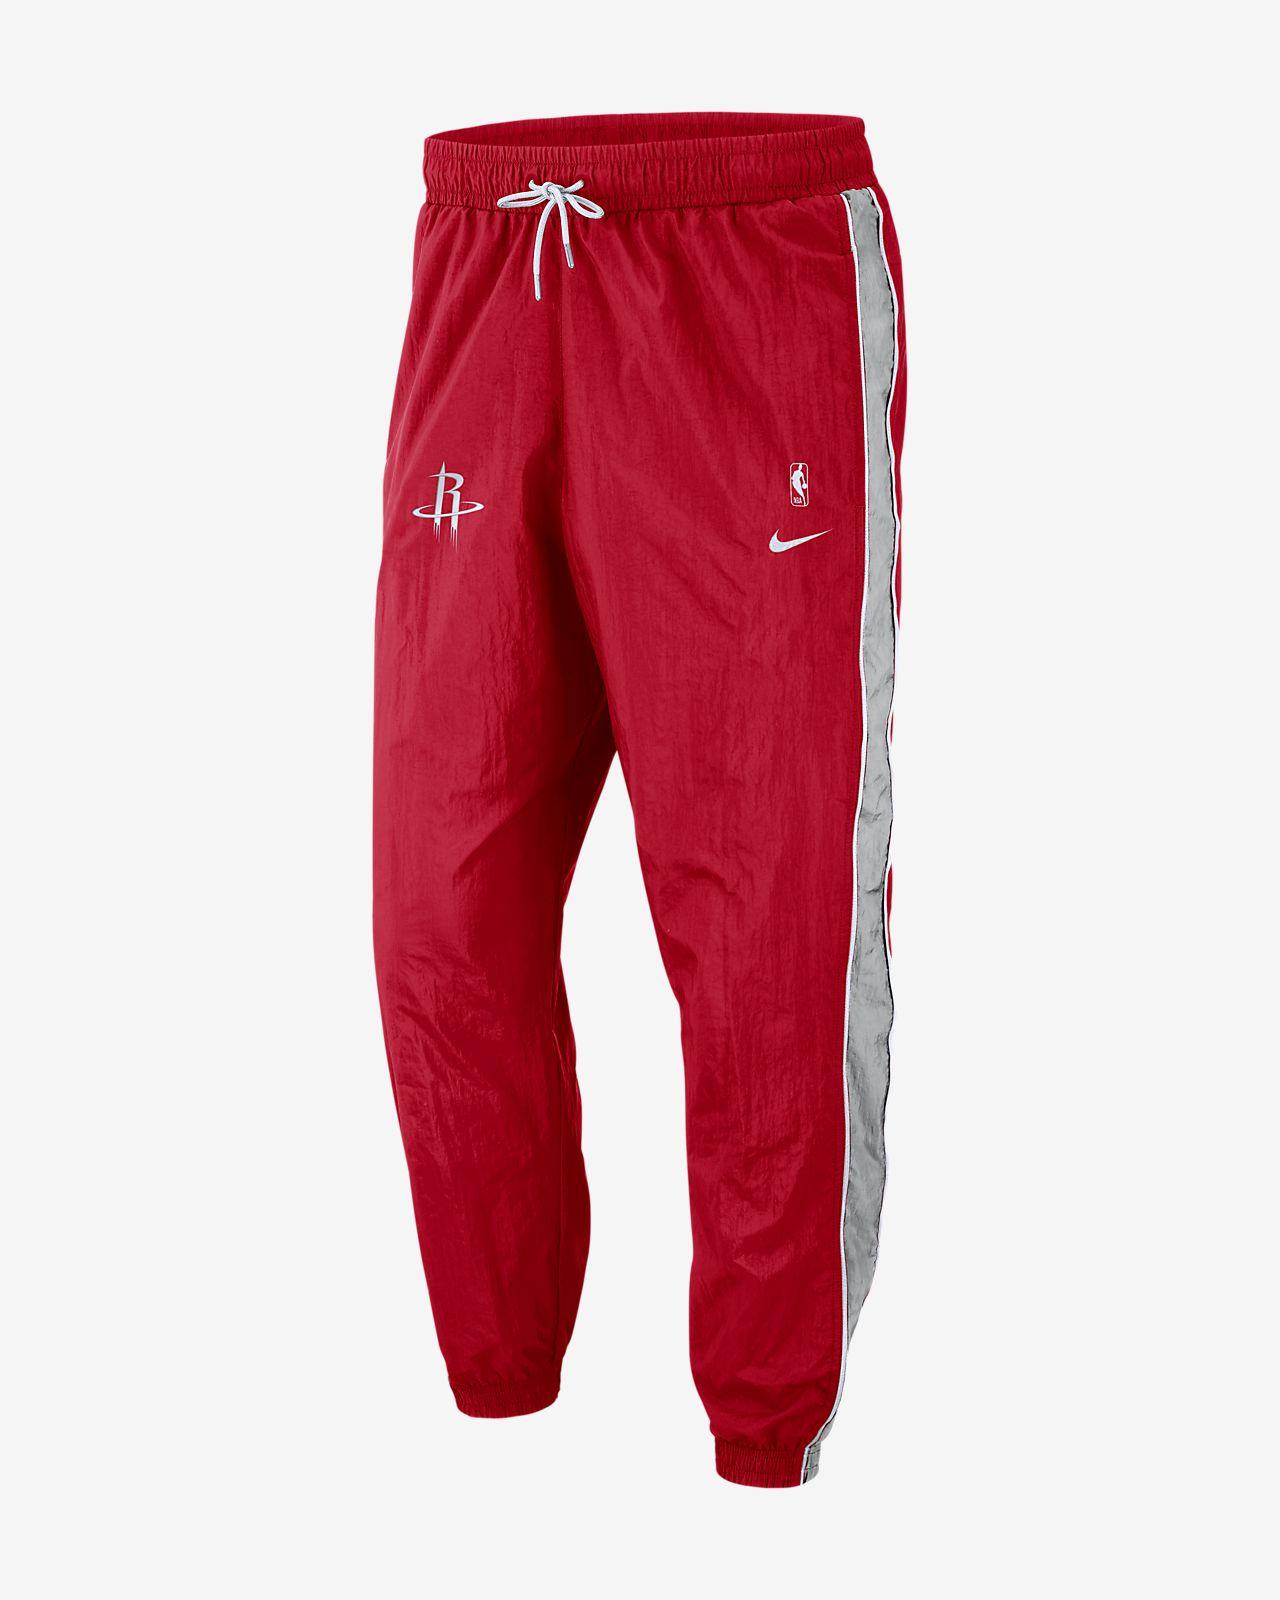 Houston Rockets Nike Men's NBA Tracksuit Pants